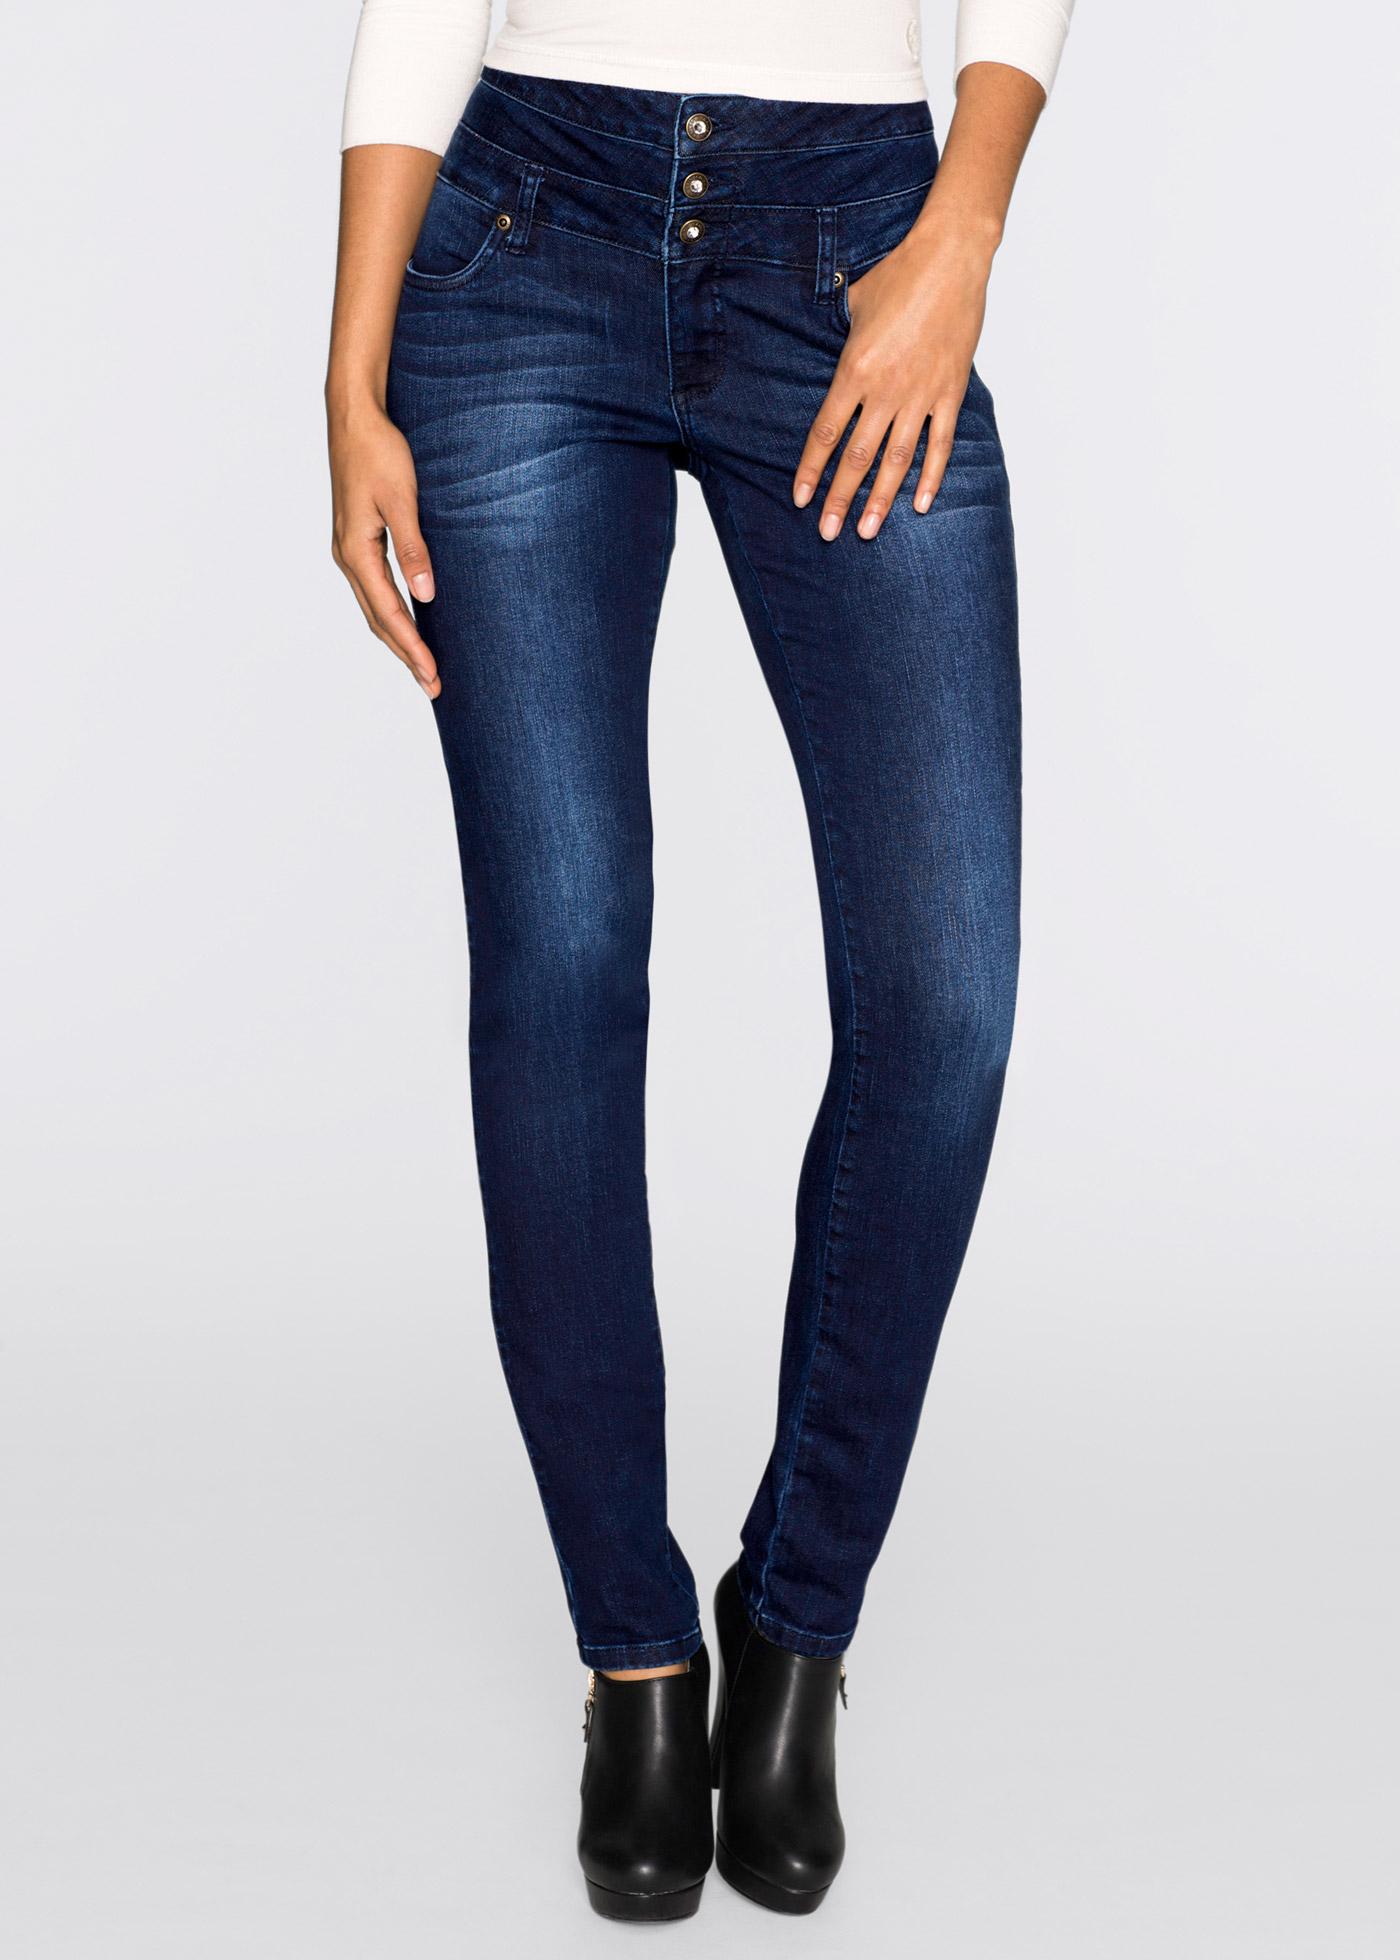 Skinny džíny High Waist, s dlouhou knoflíkovou légou - Modrá